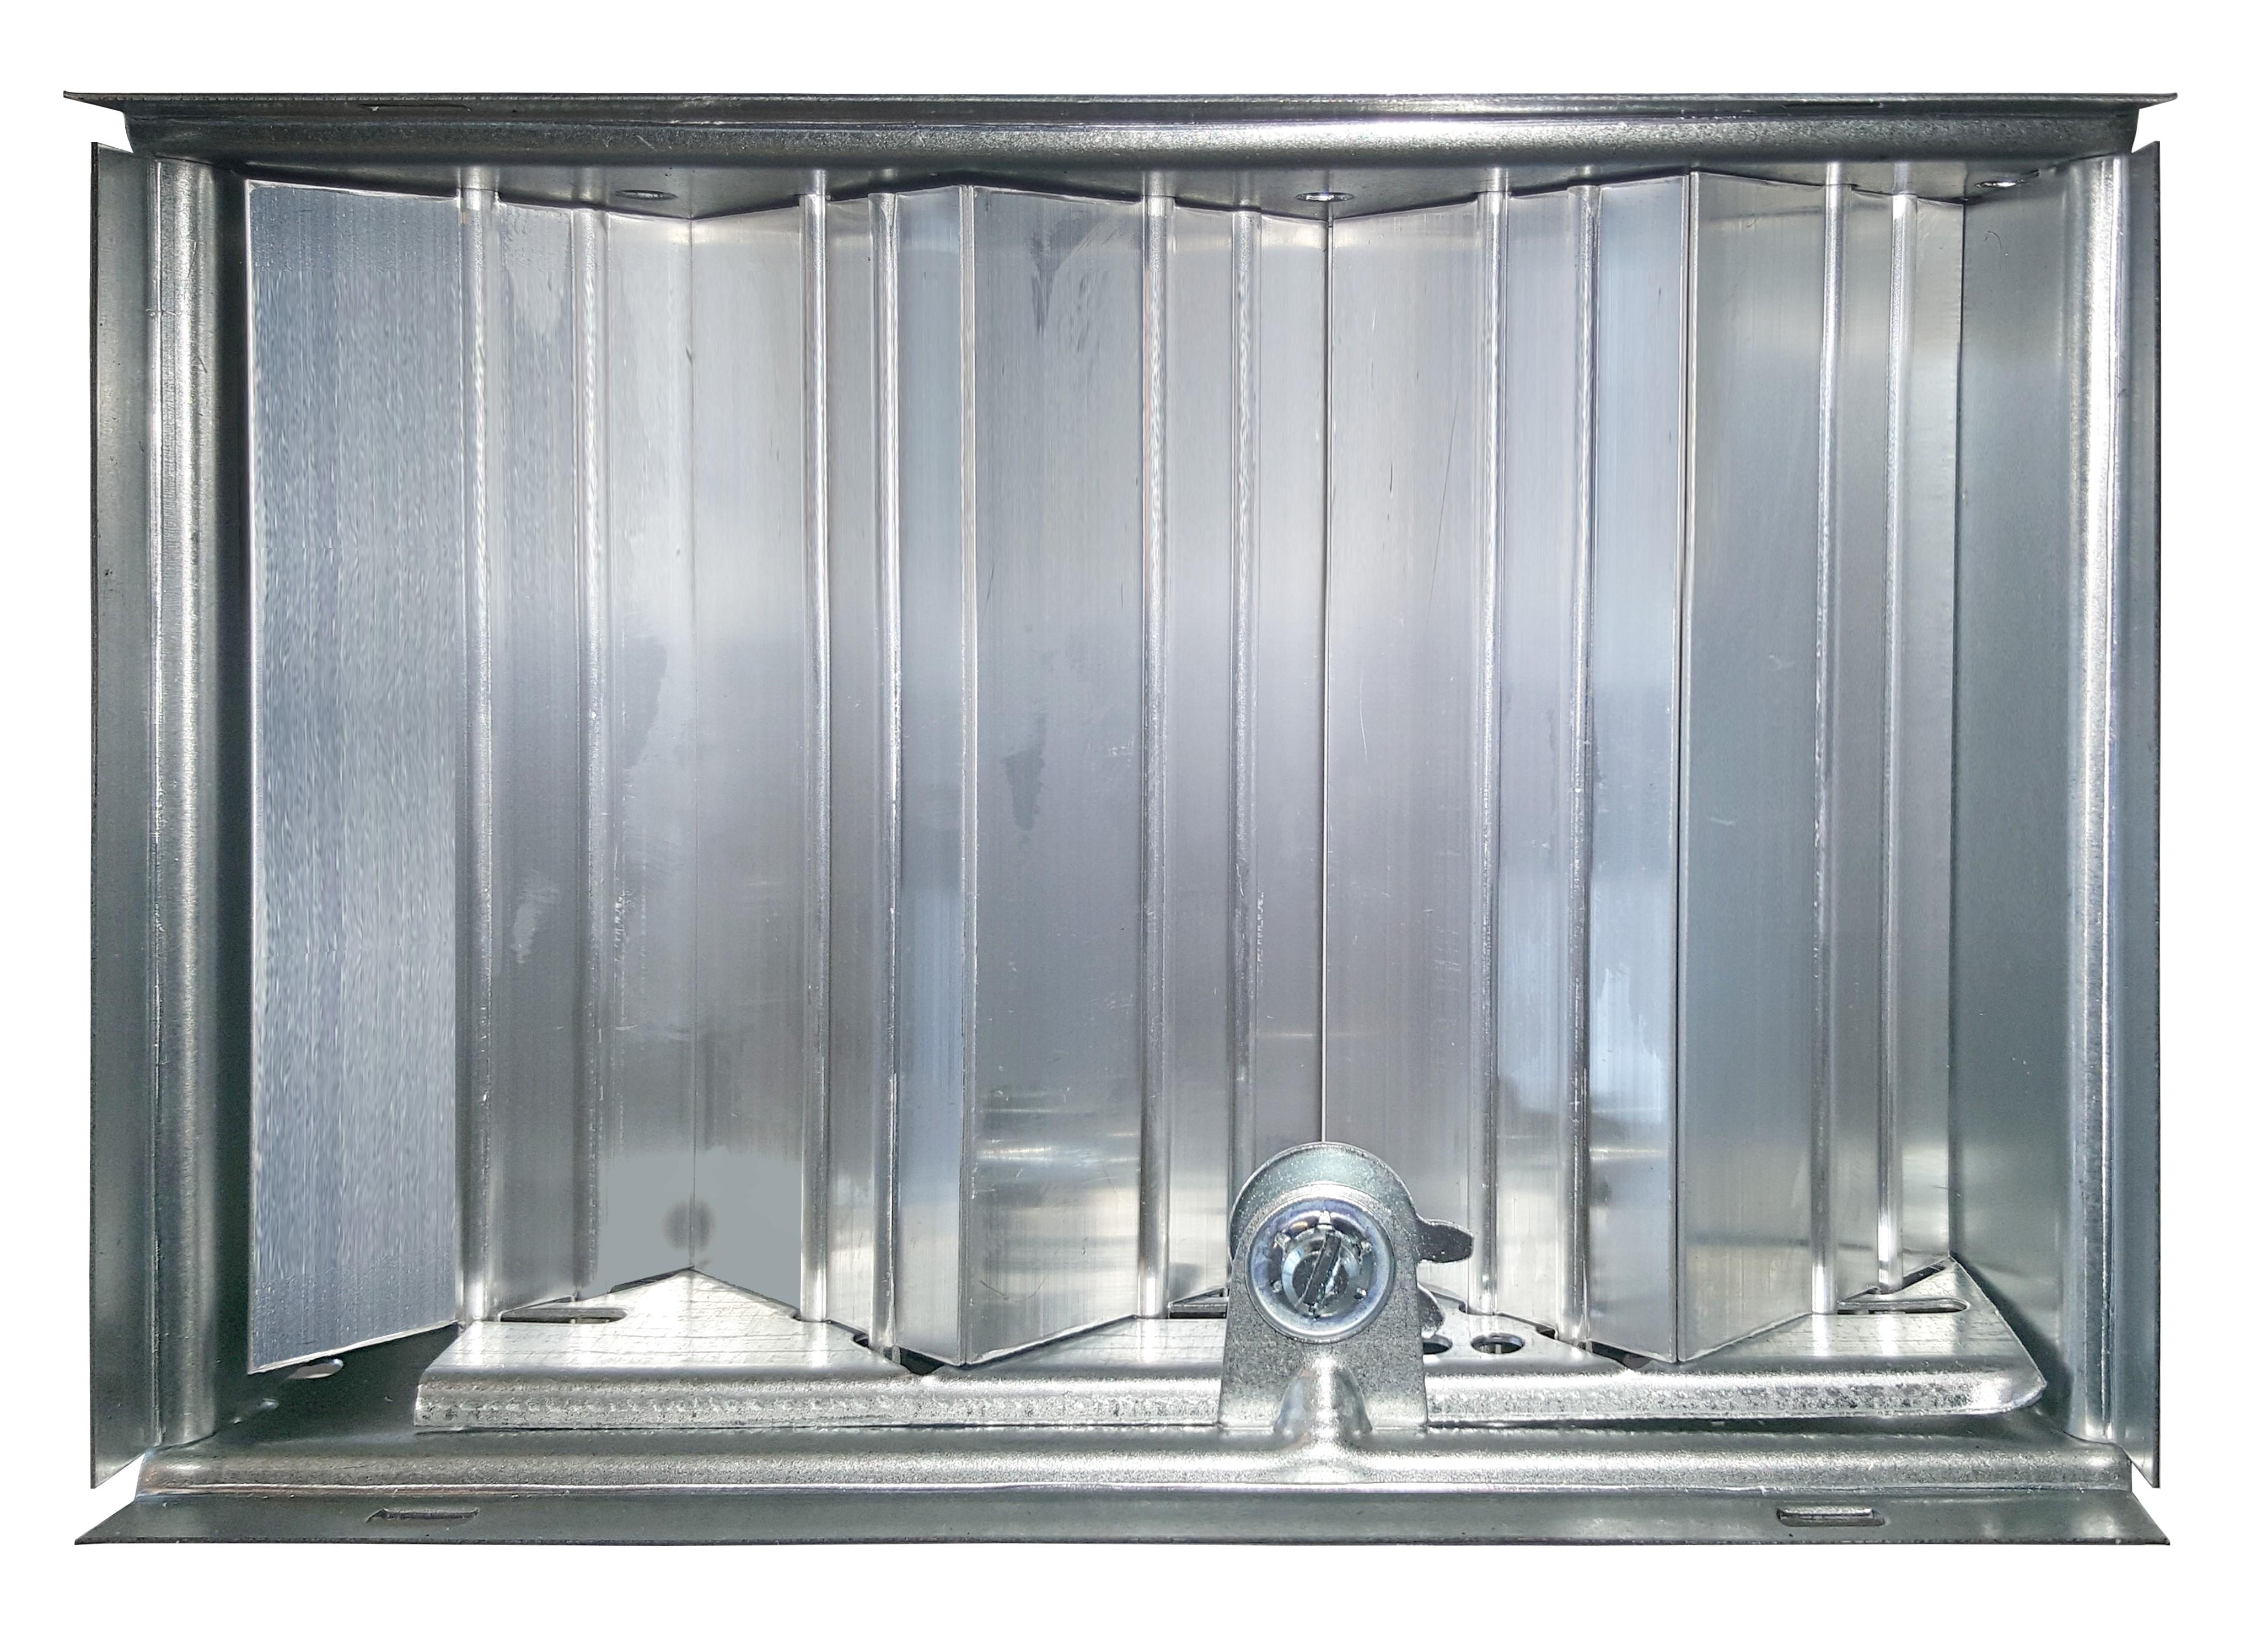 Serranda di regolazione a contrasto per bocchette dimensione 1000x400 mm serie BBMA/BGRA